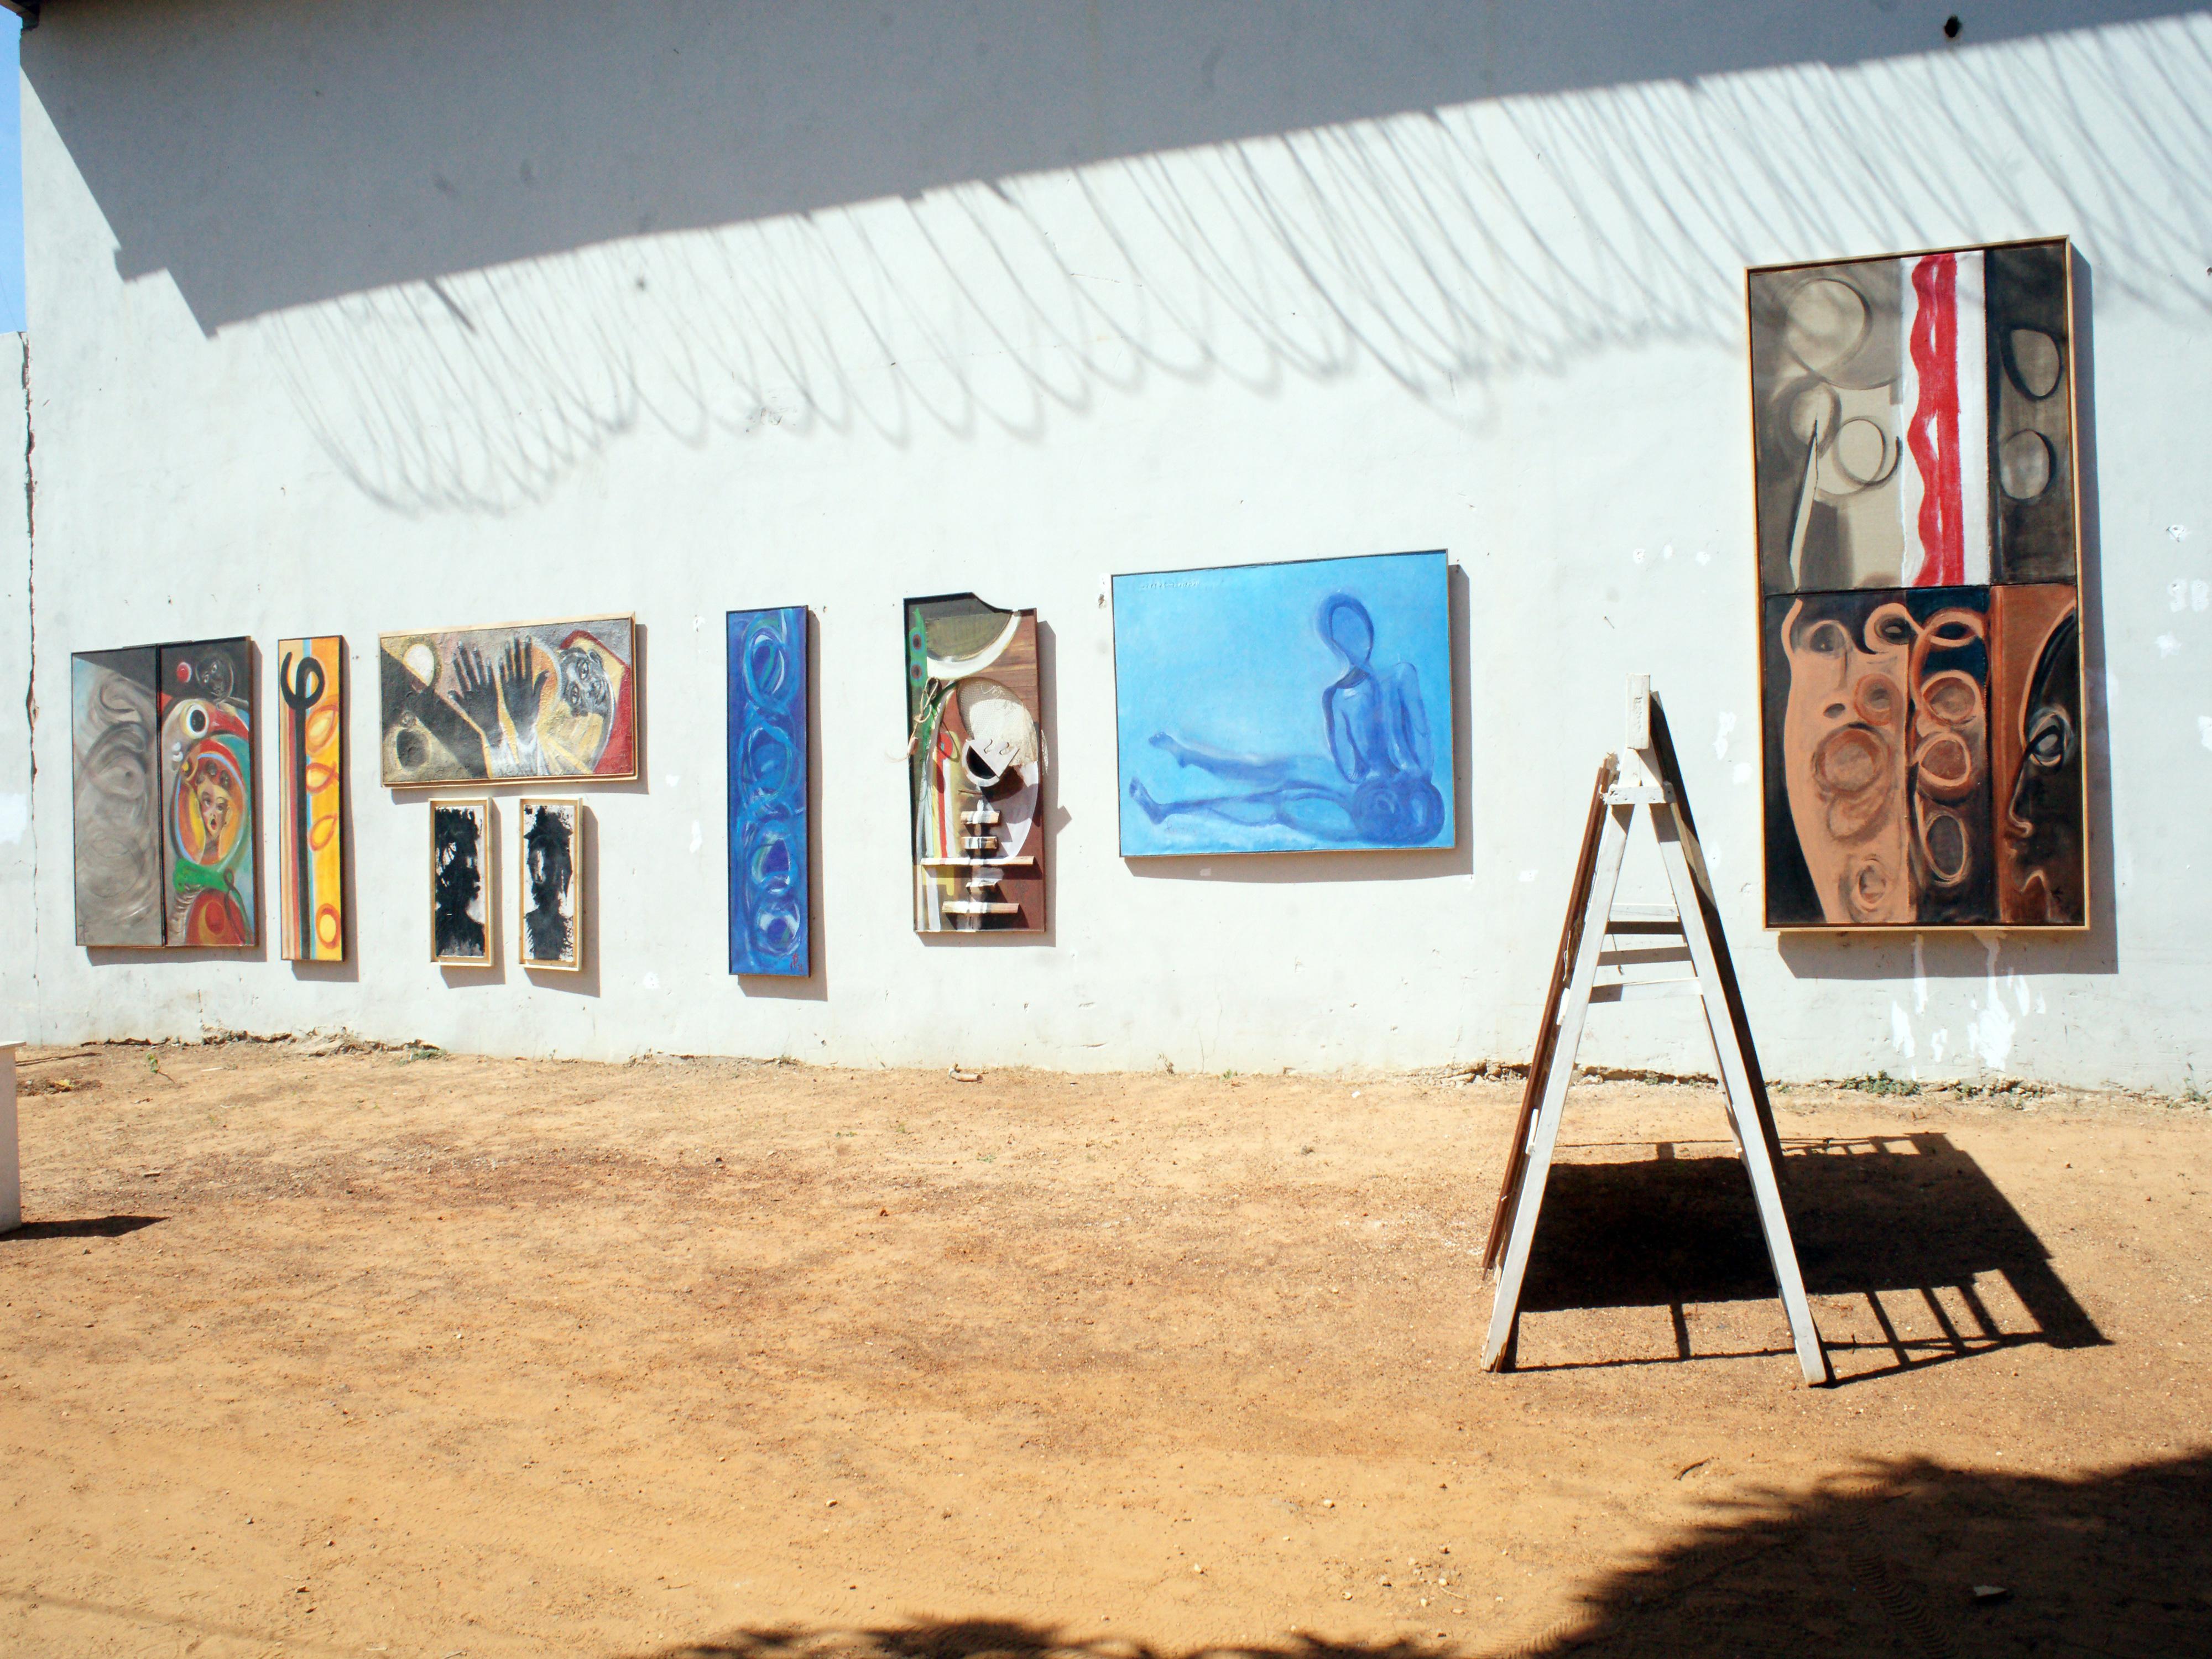 Galerie Barbara Thumm \ El Hadji Sy – Musée de la Rue, Dakar